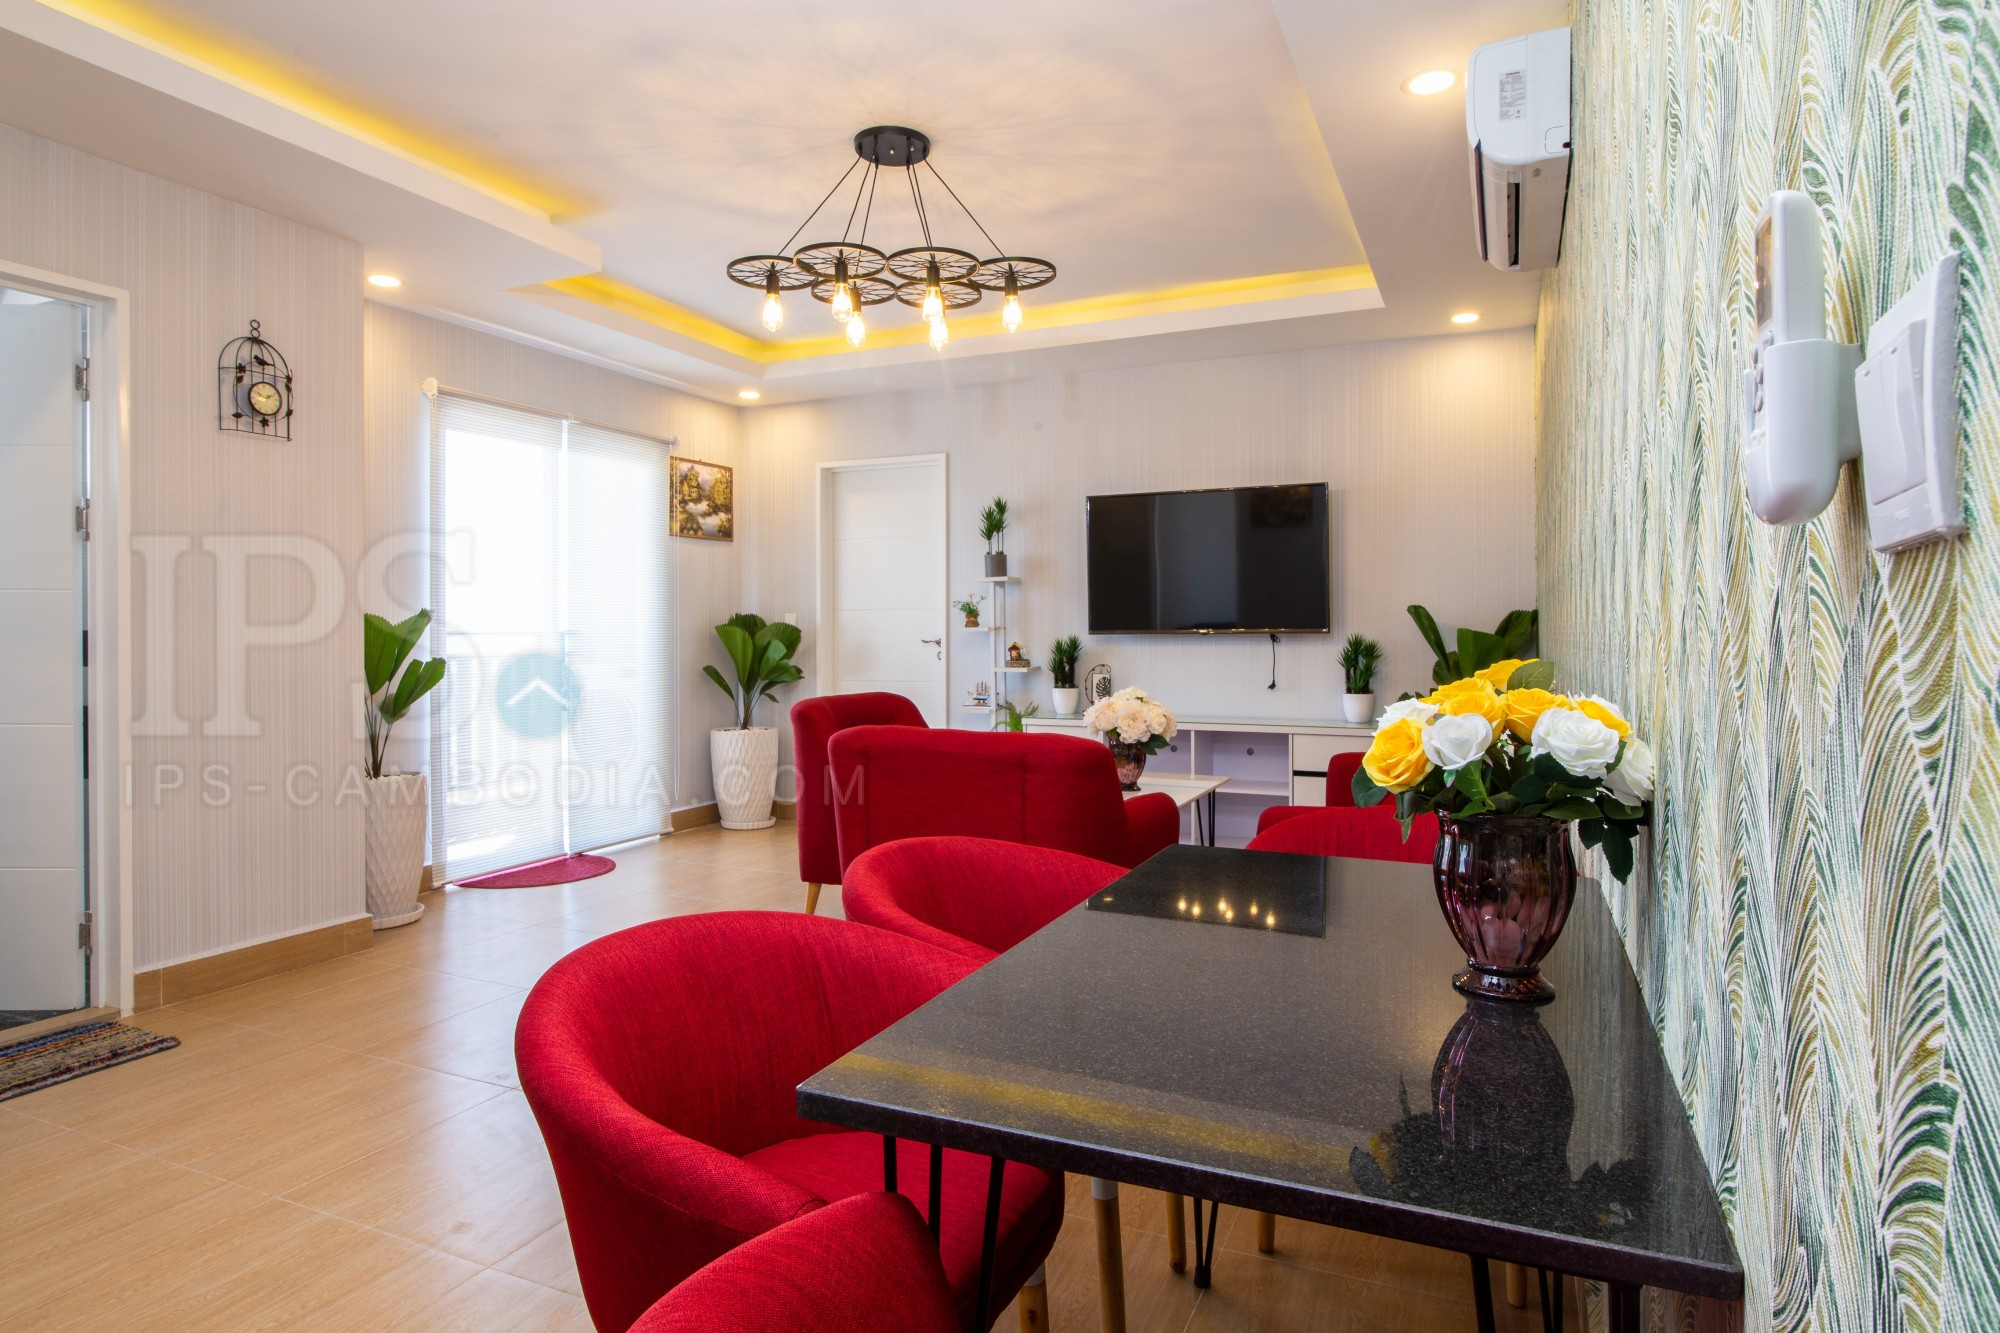 2 Bedroom Apartment  For Sale - Boeung Keng Kang 3, Phnom Penh